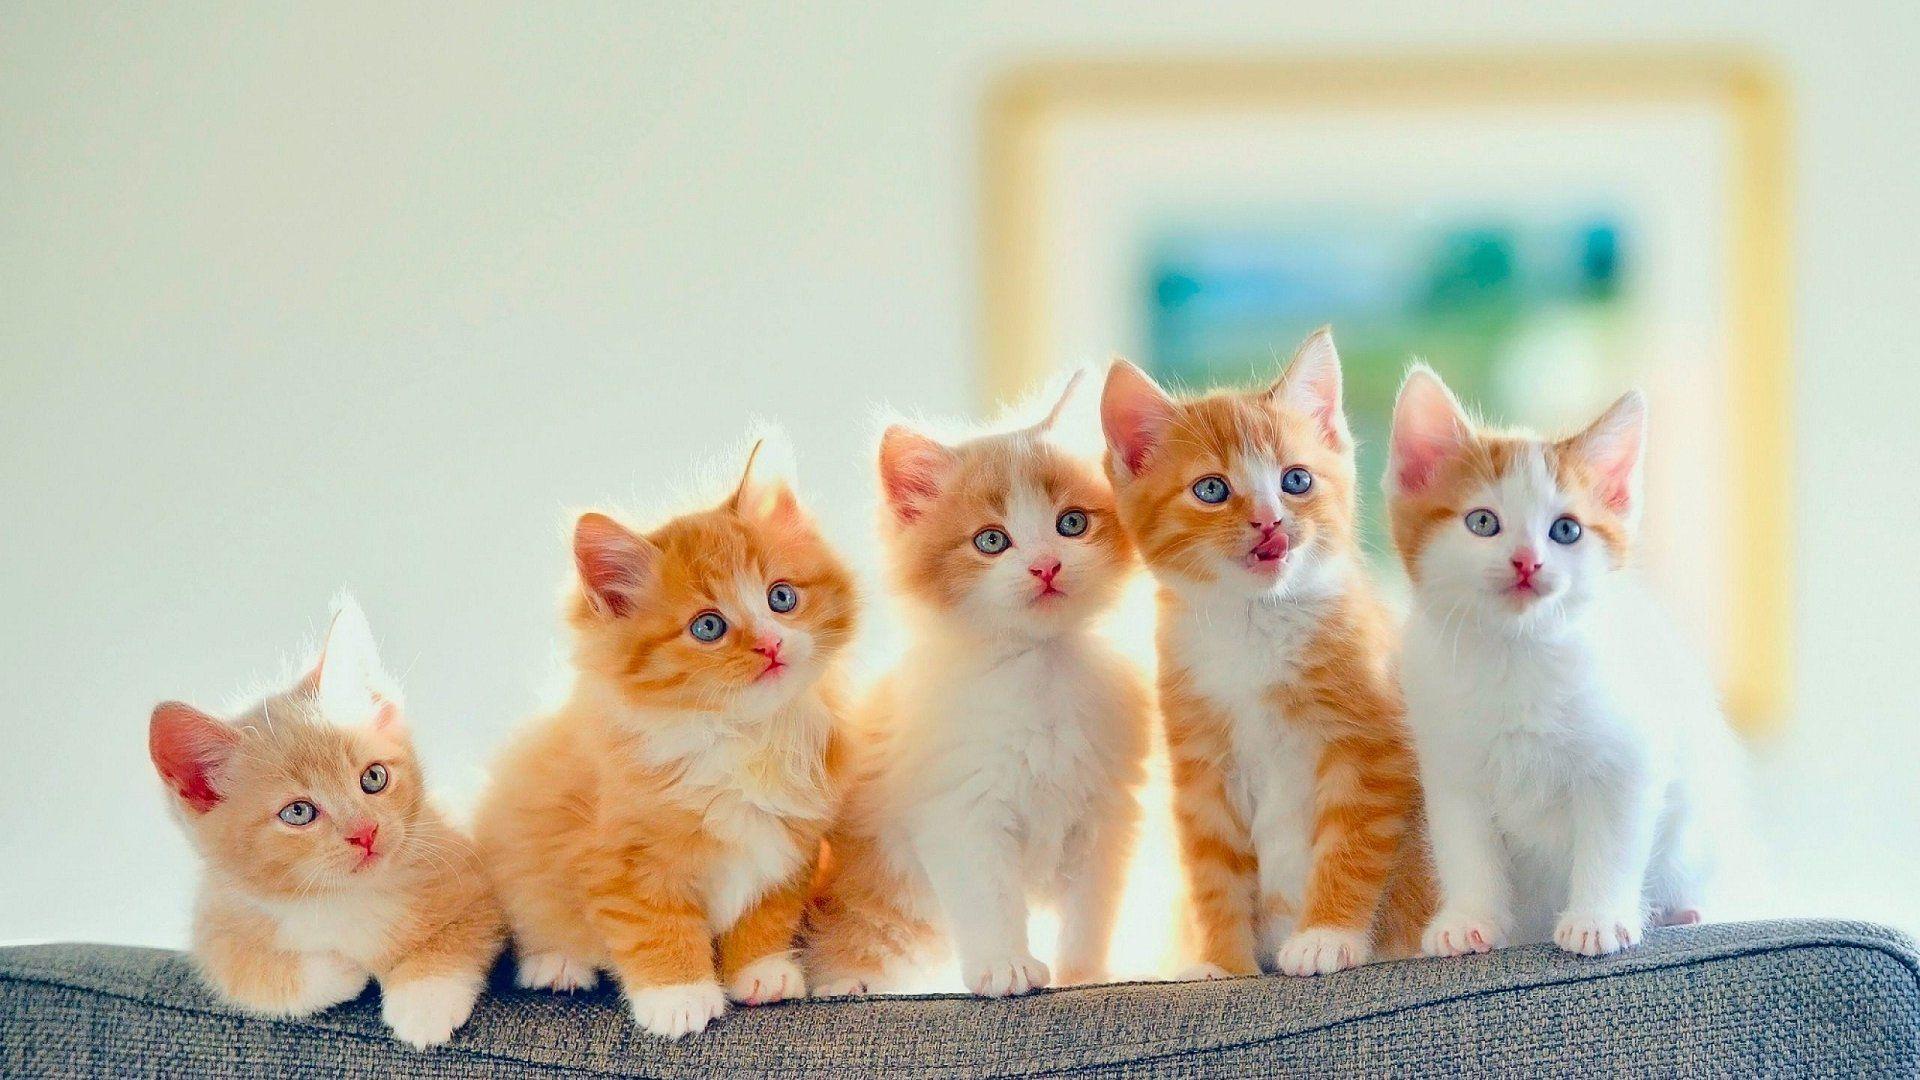 Iphone X Wallpaper Live Custom Golden Kitten Wallpaper Wallpaper Kitten Wallpaper